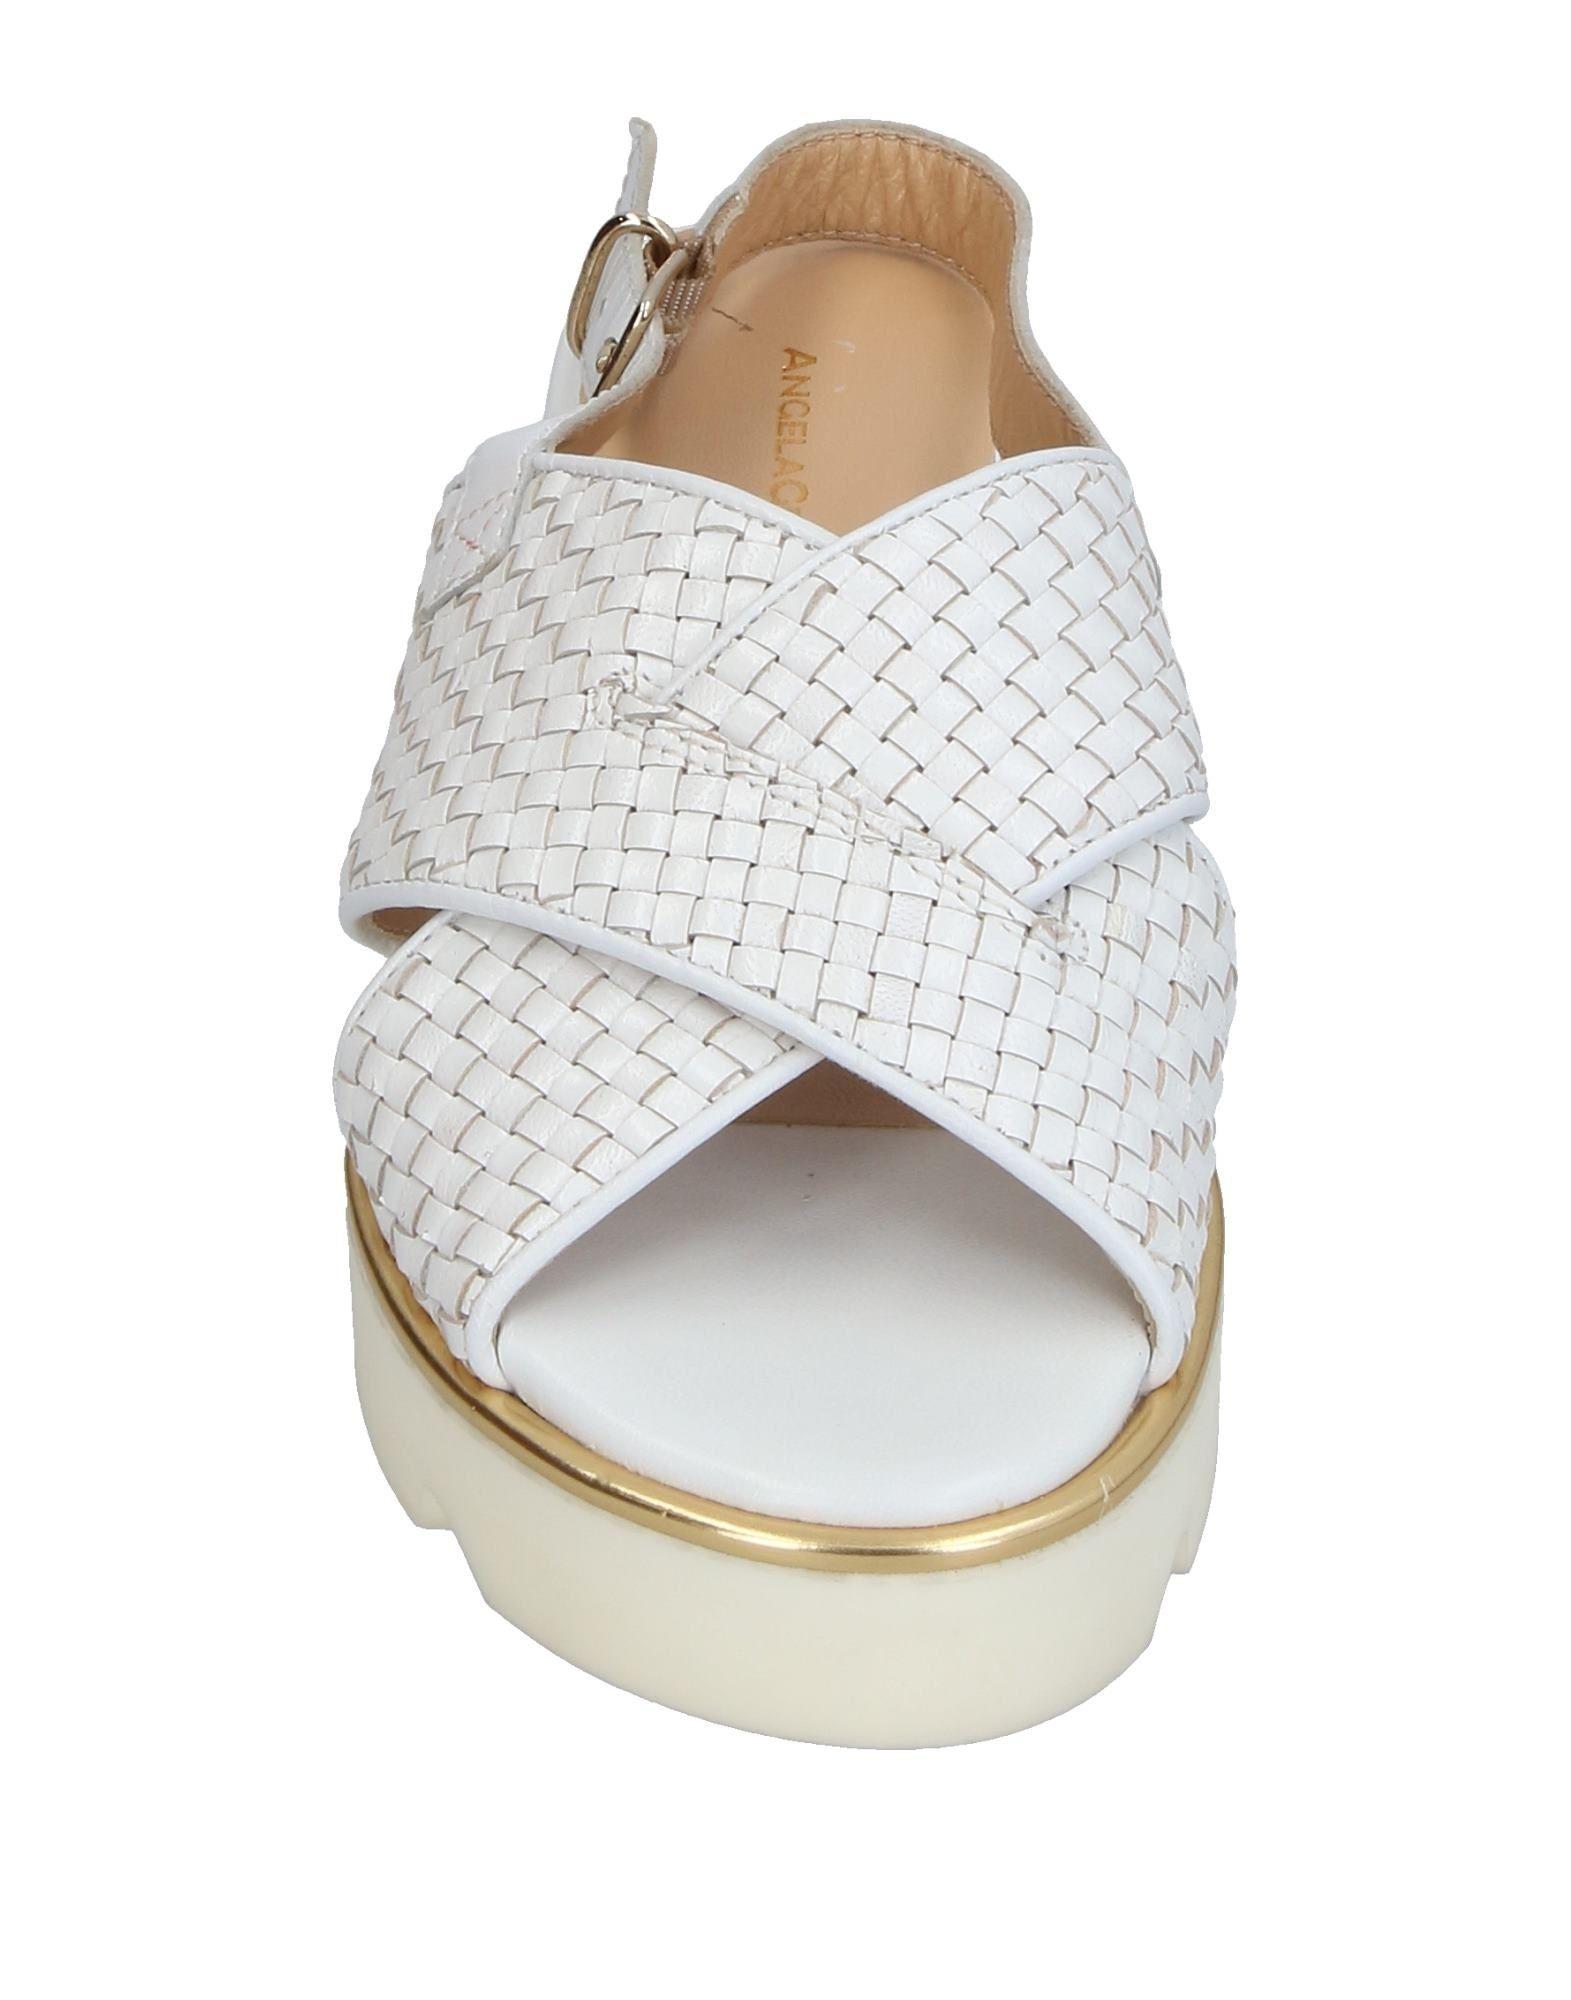 Chaussures - Sandales Angela George WnS3Abfn5